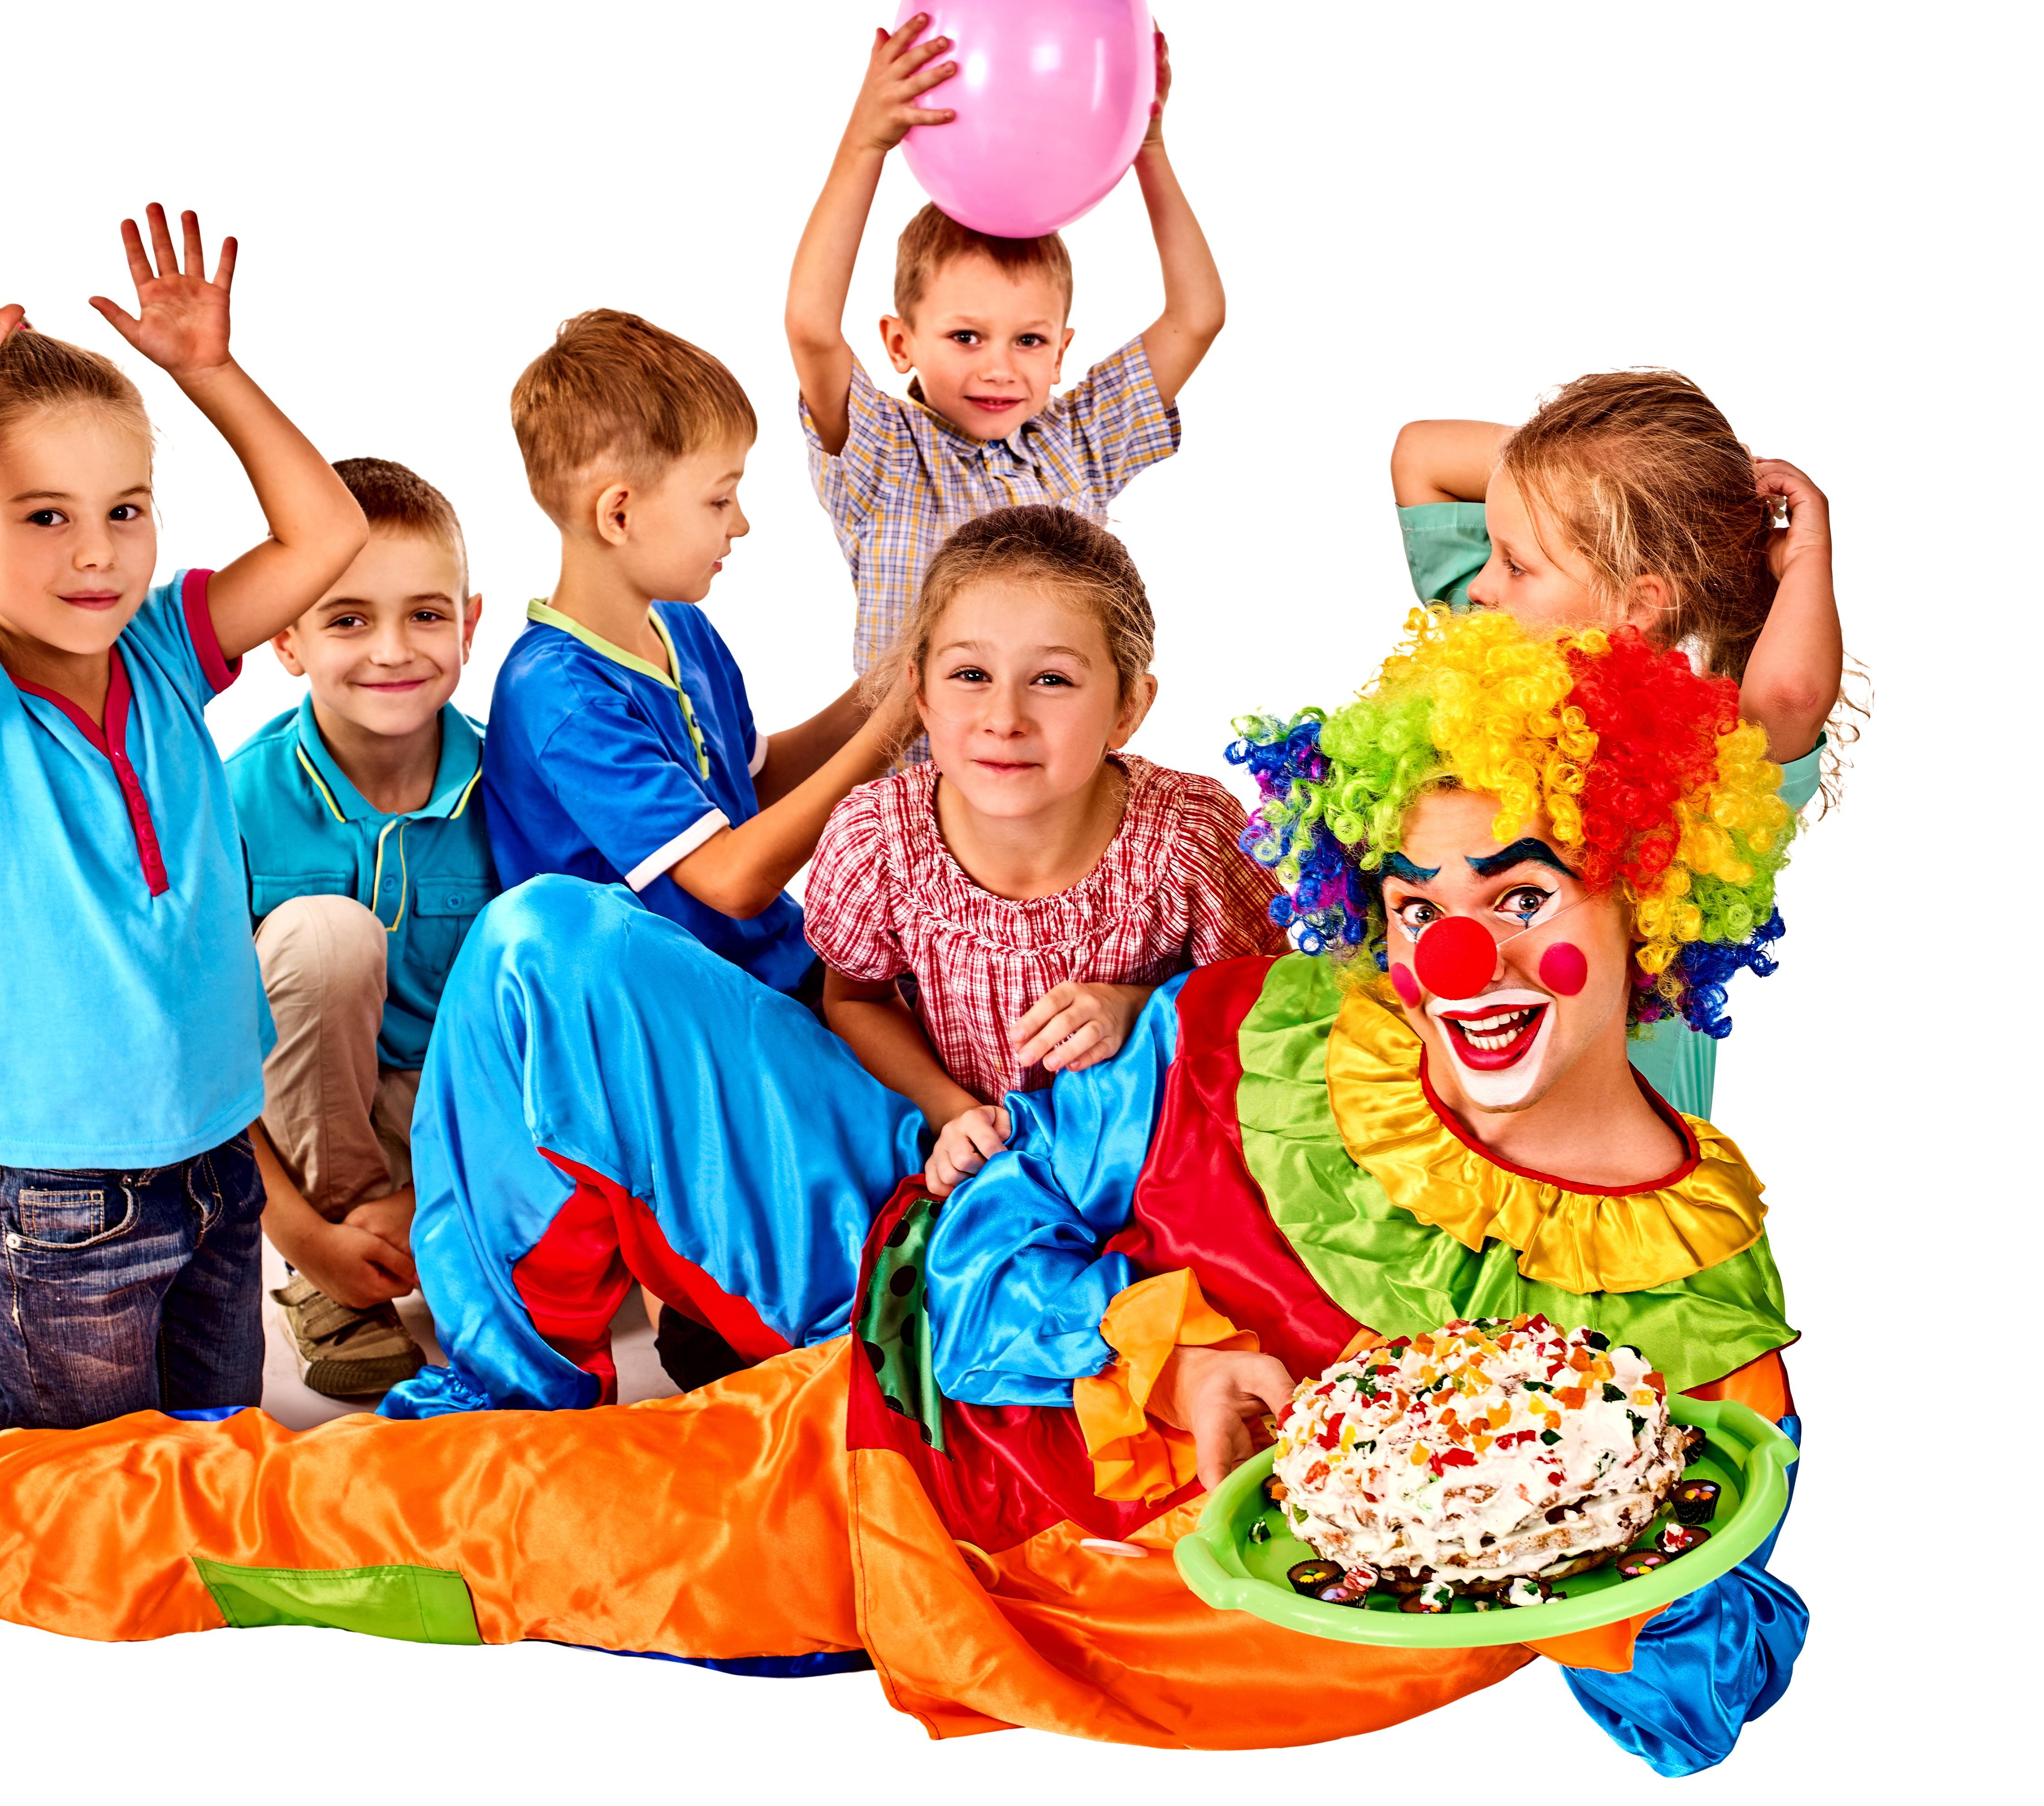 clown with children and birthday cake